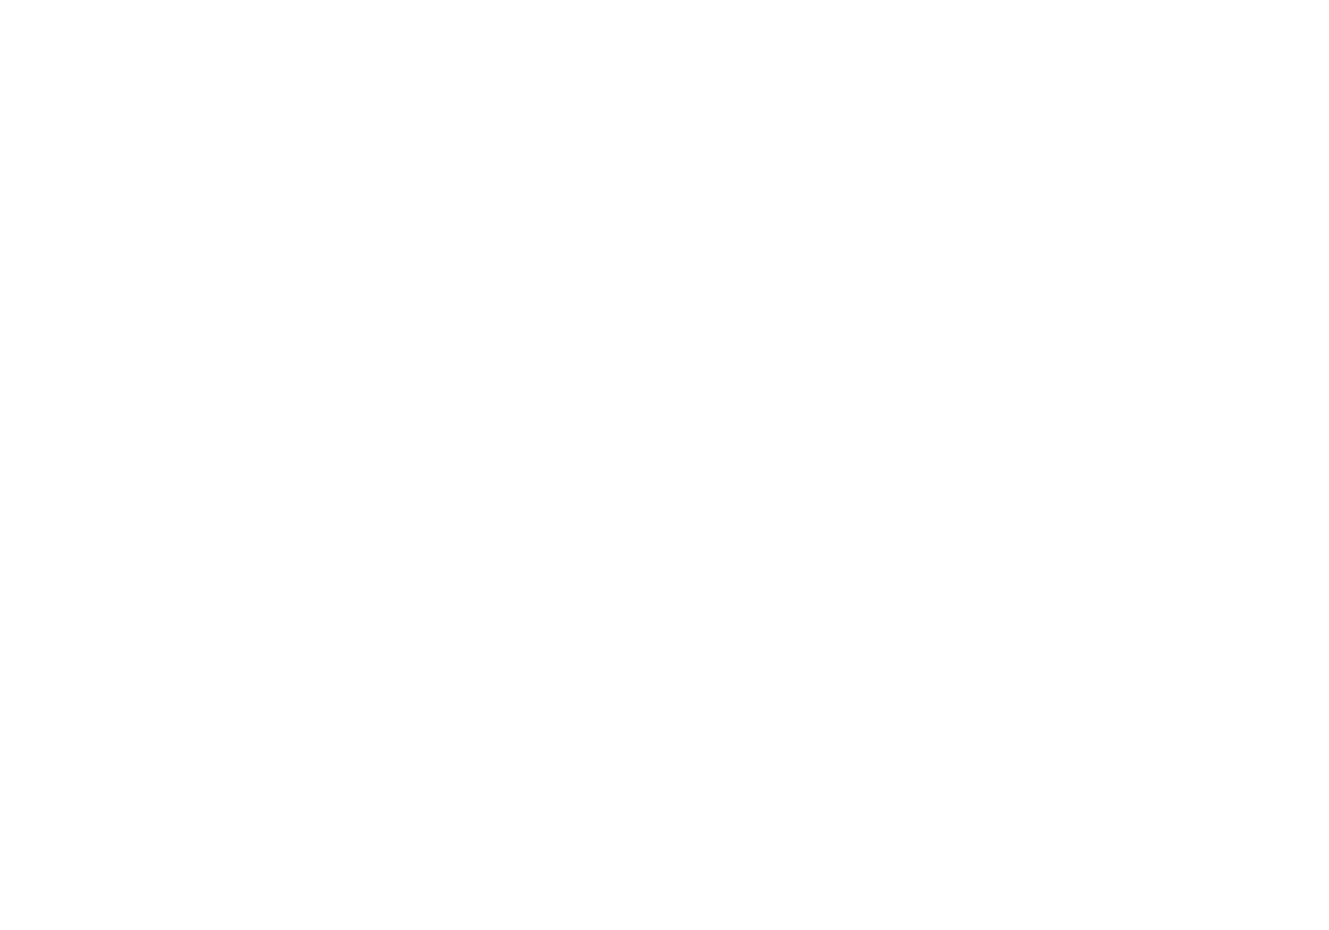 360 Up